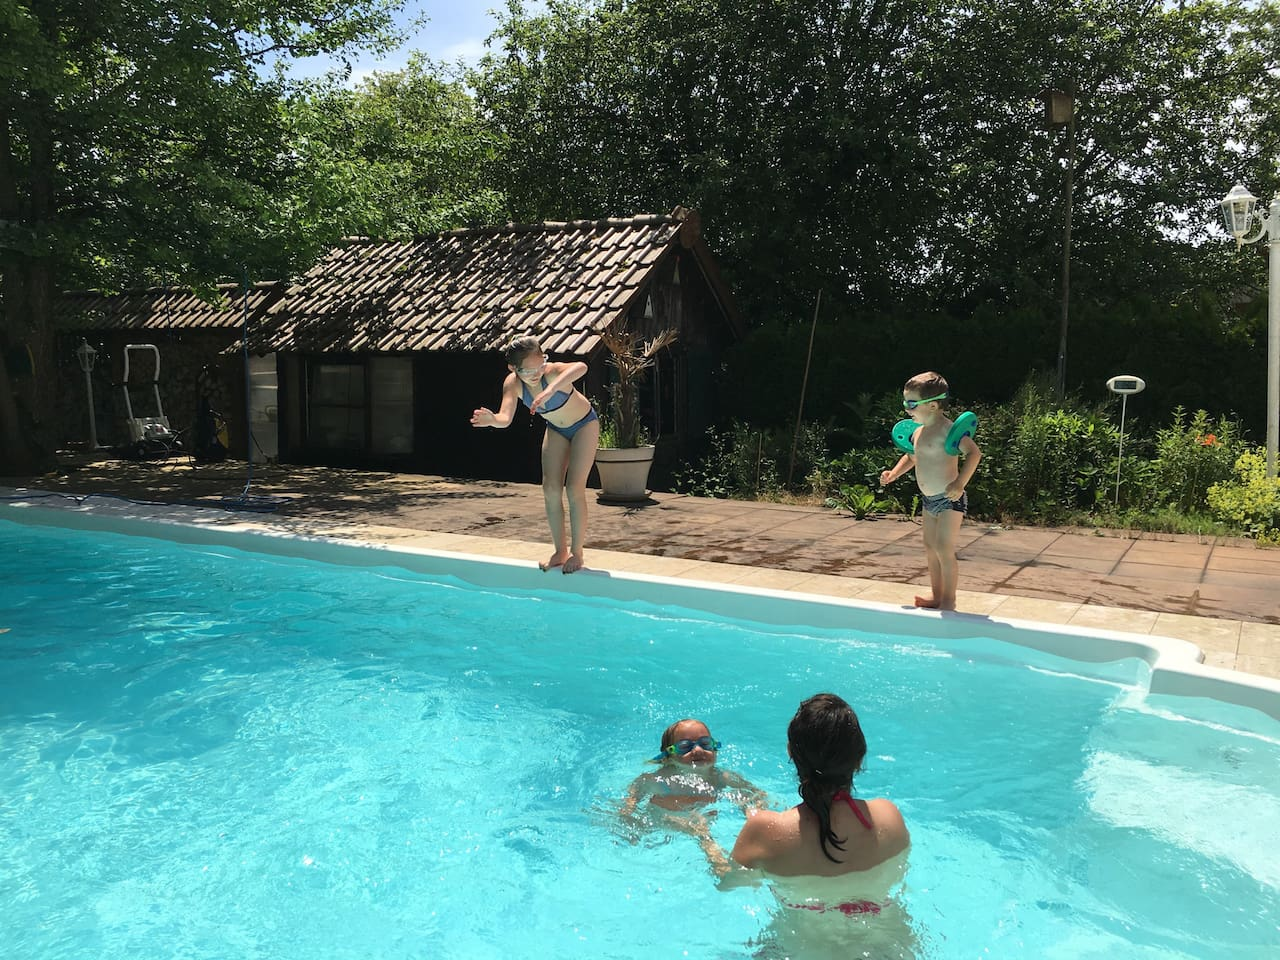 Swimmingpool bis Oktober auf 25 Grad beheizt.